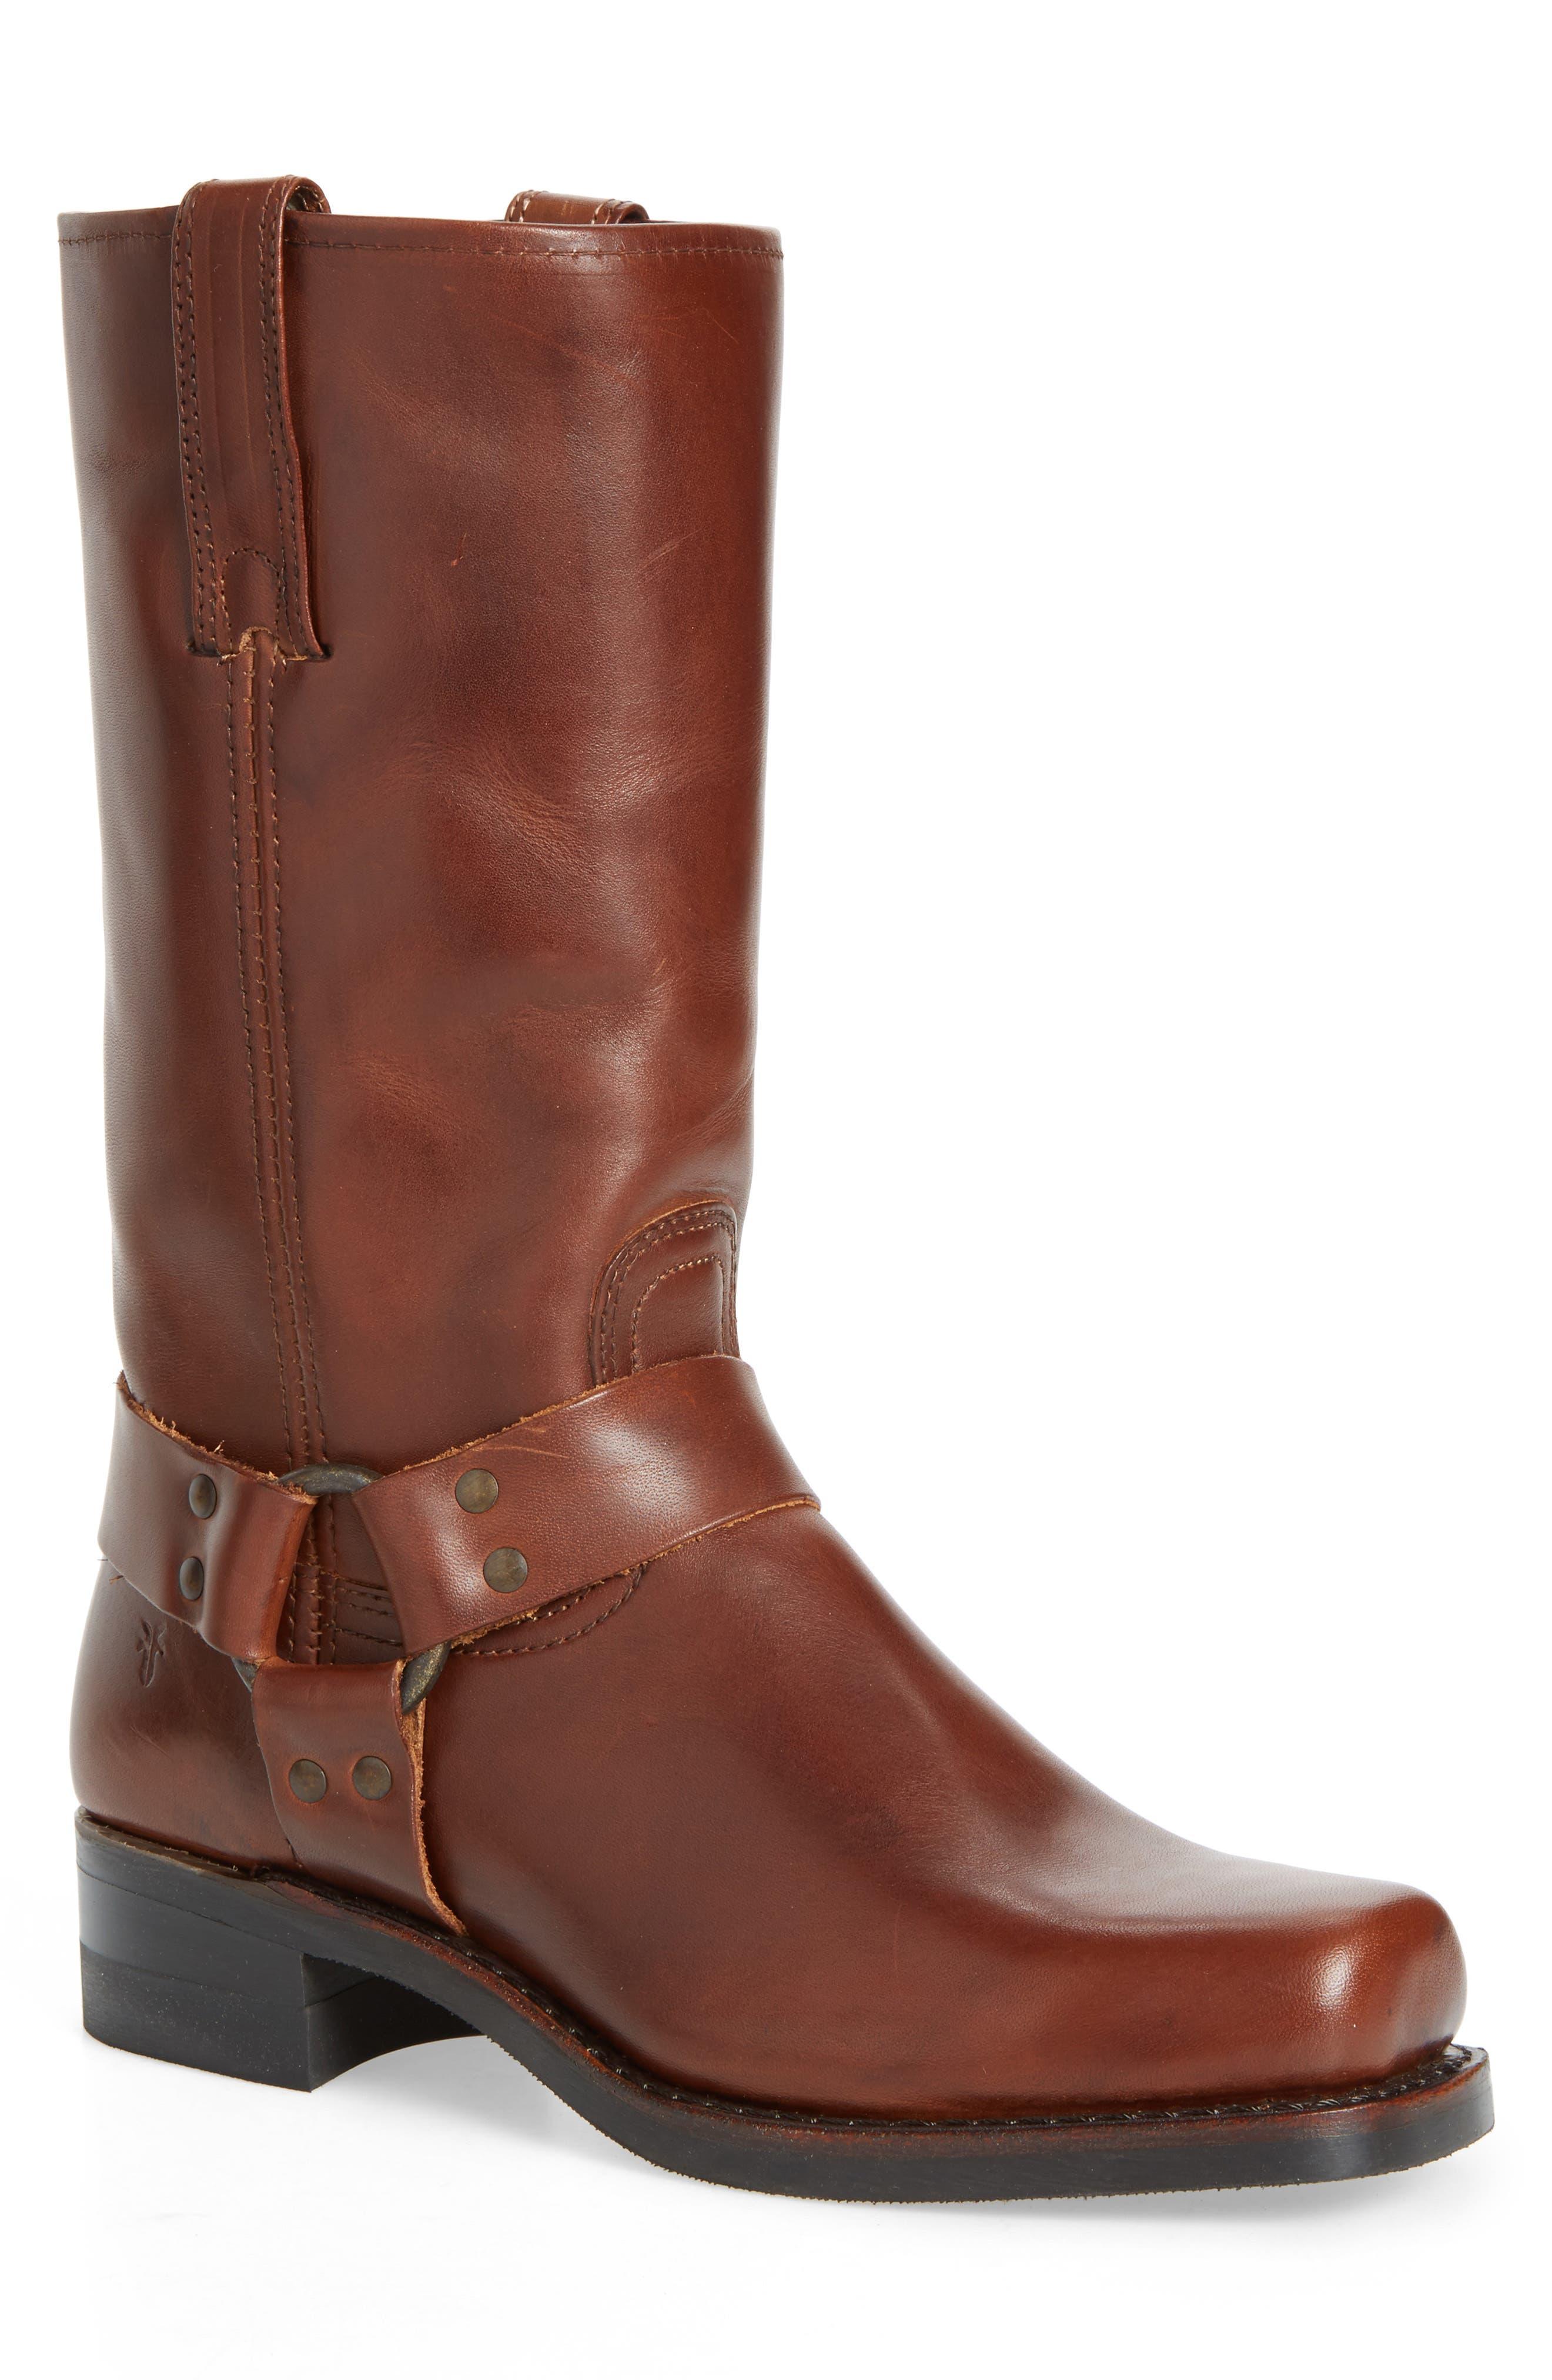 12R Harness Boot,                             Main thumbnail 1, color,                             218